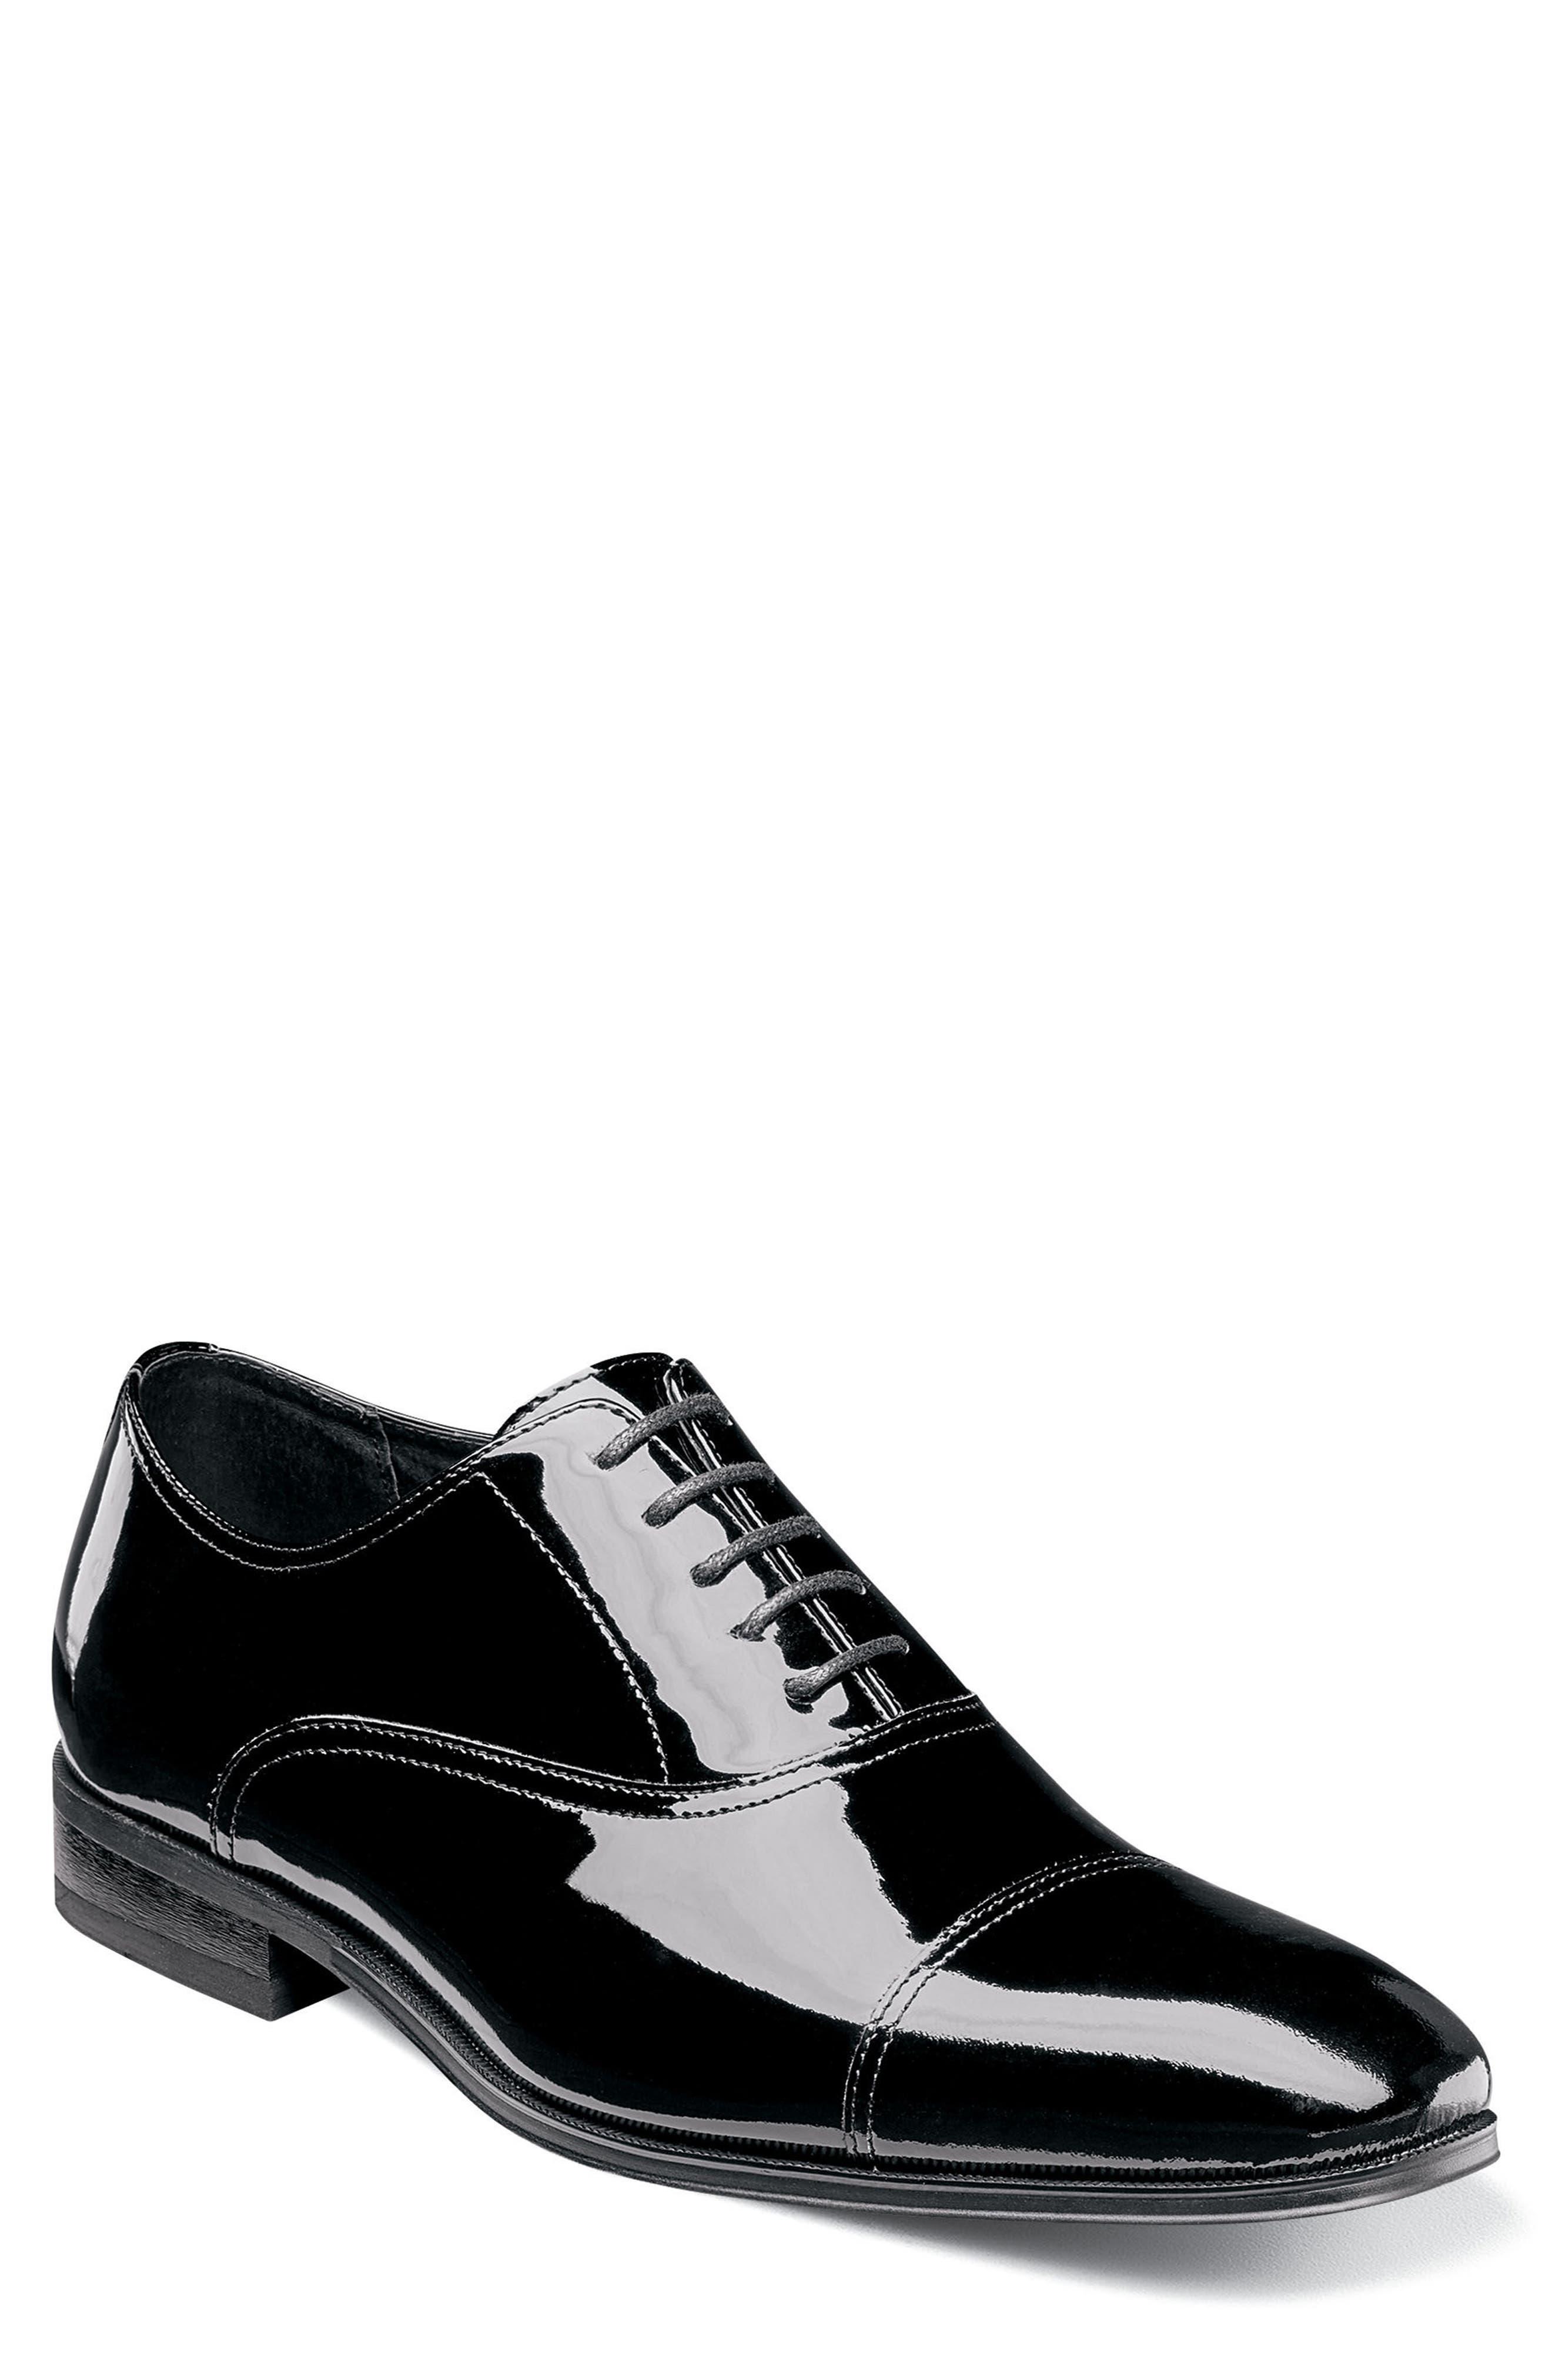 Florsheim Tux Cap Toe Oxford, Black